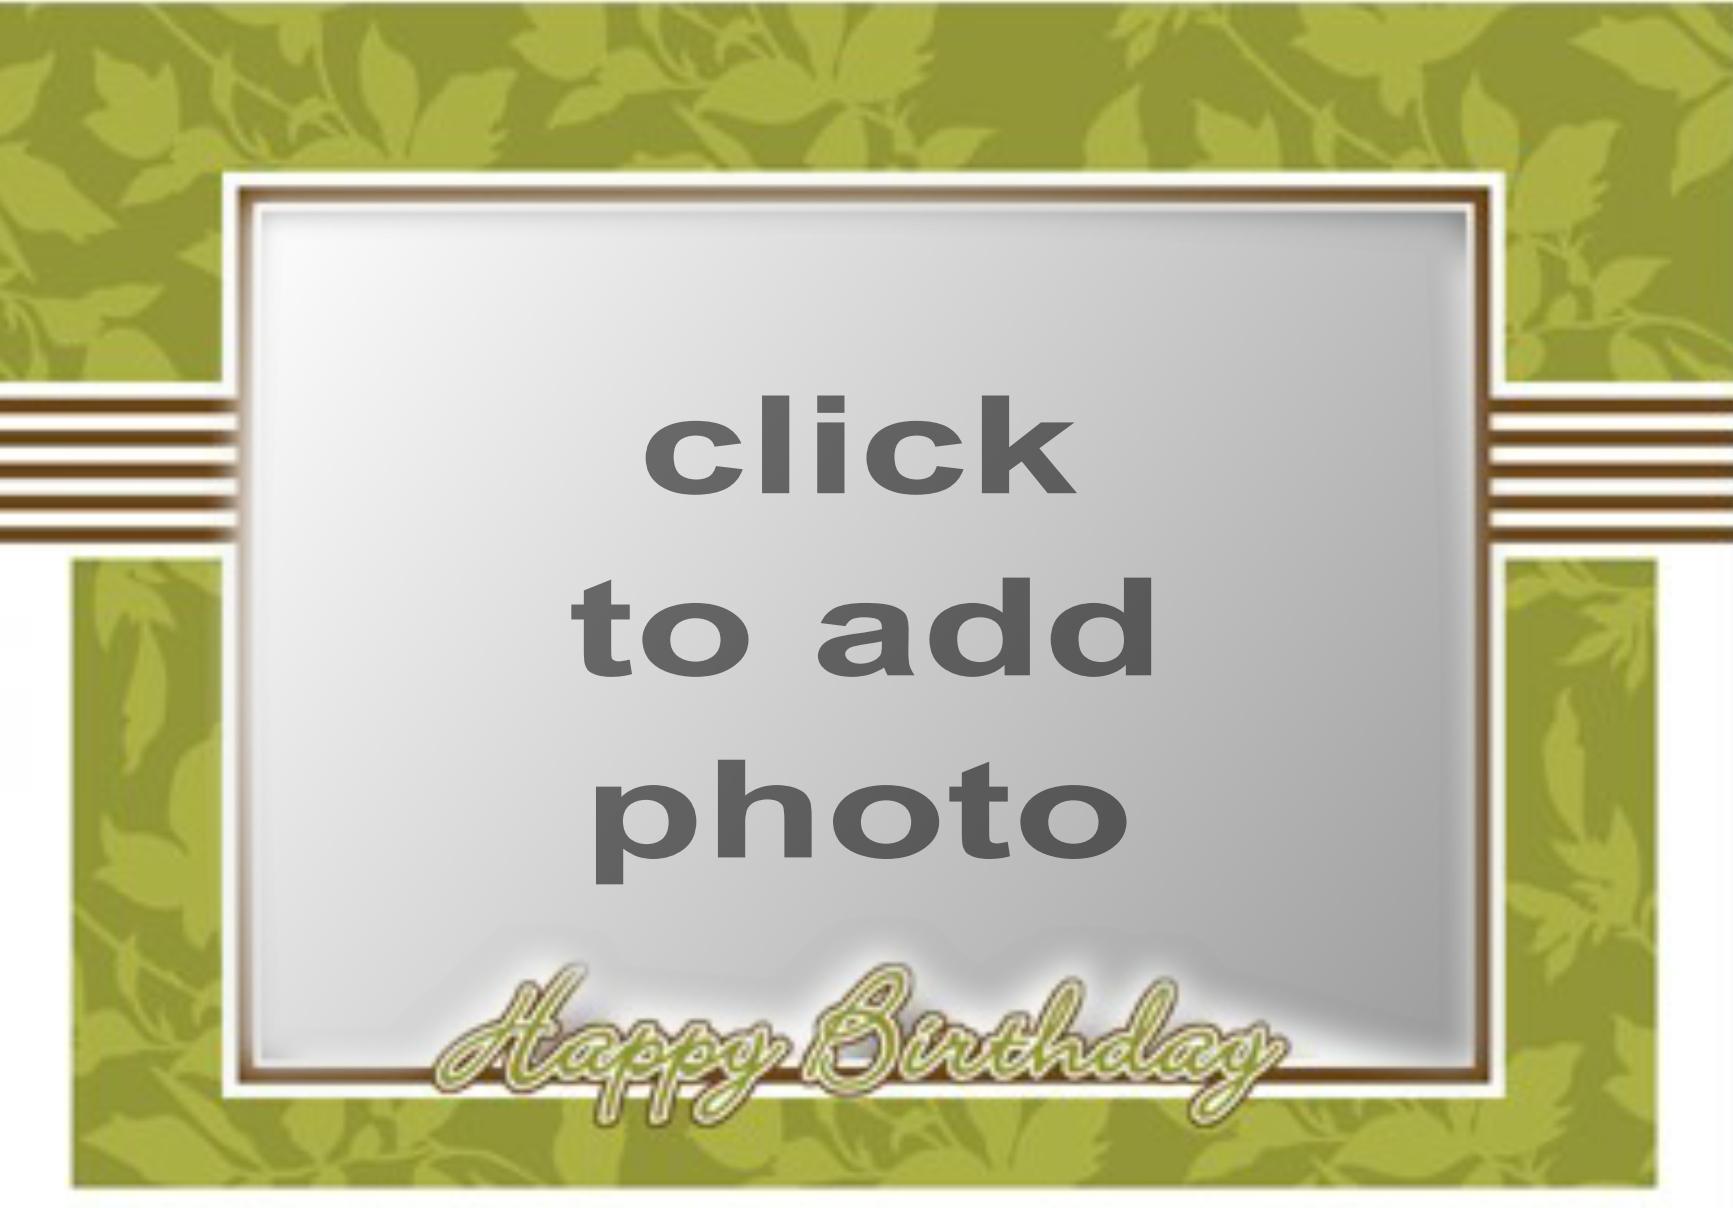 Amazing Luxury Imikimi Frames Birthday Elaboration Framed Art ...